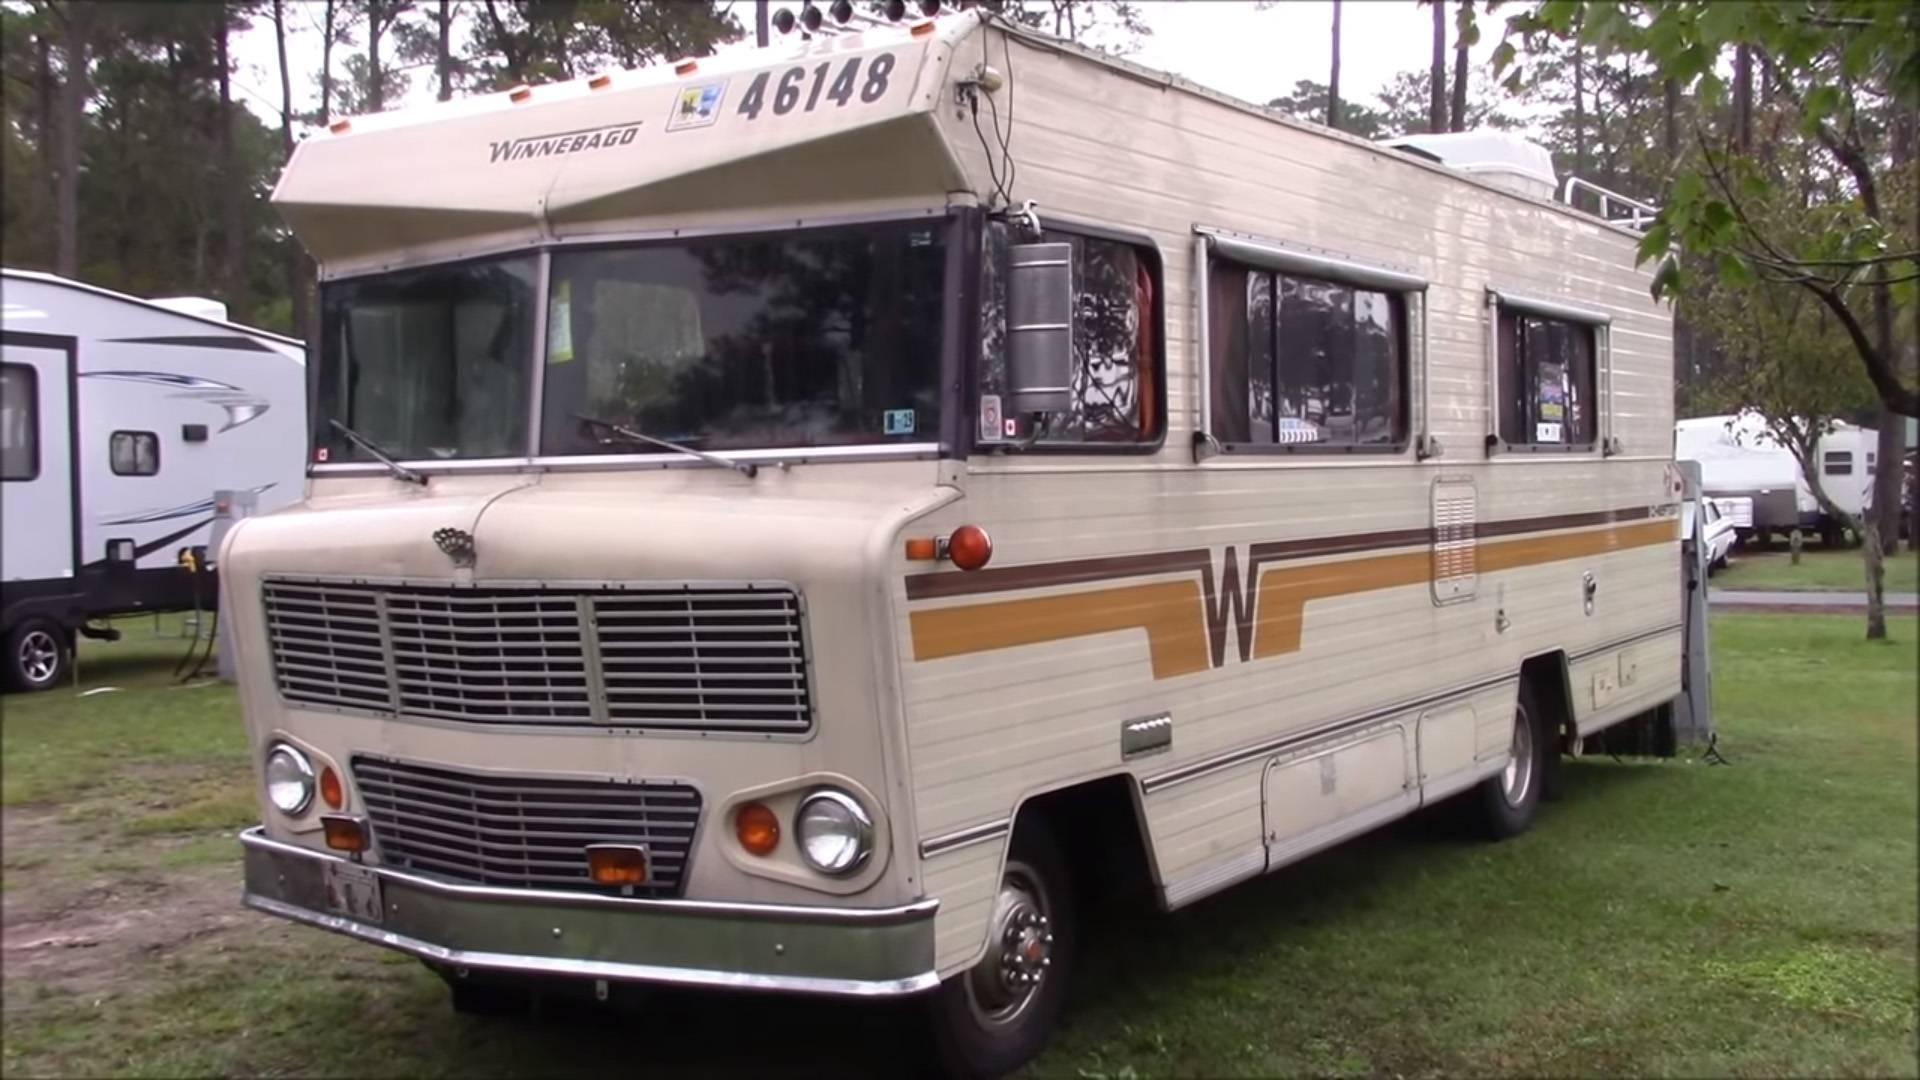 Дом на колесах построен на «тележке» Dodge образца 1970-го года